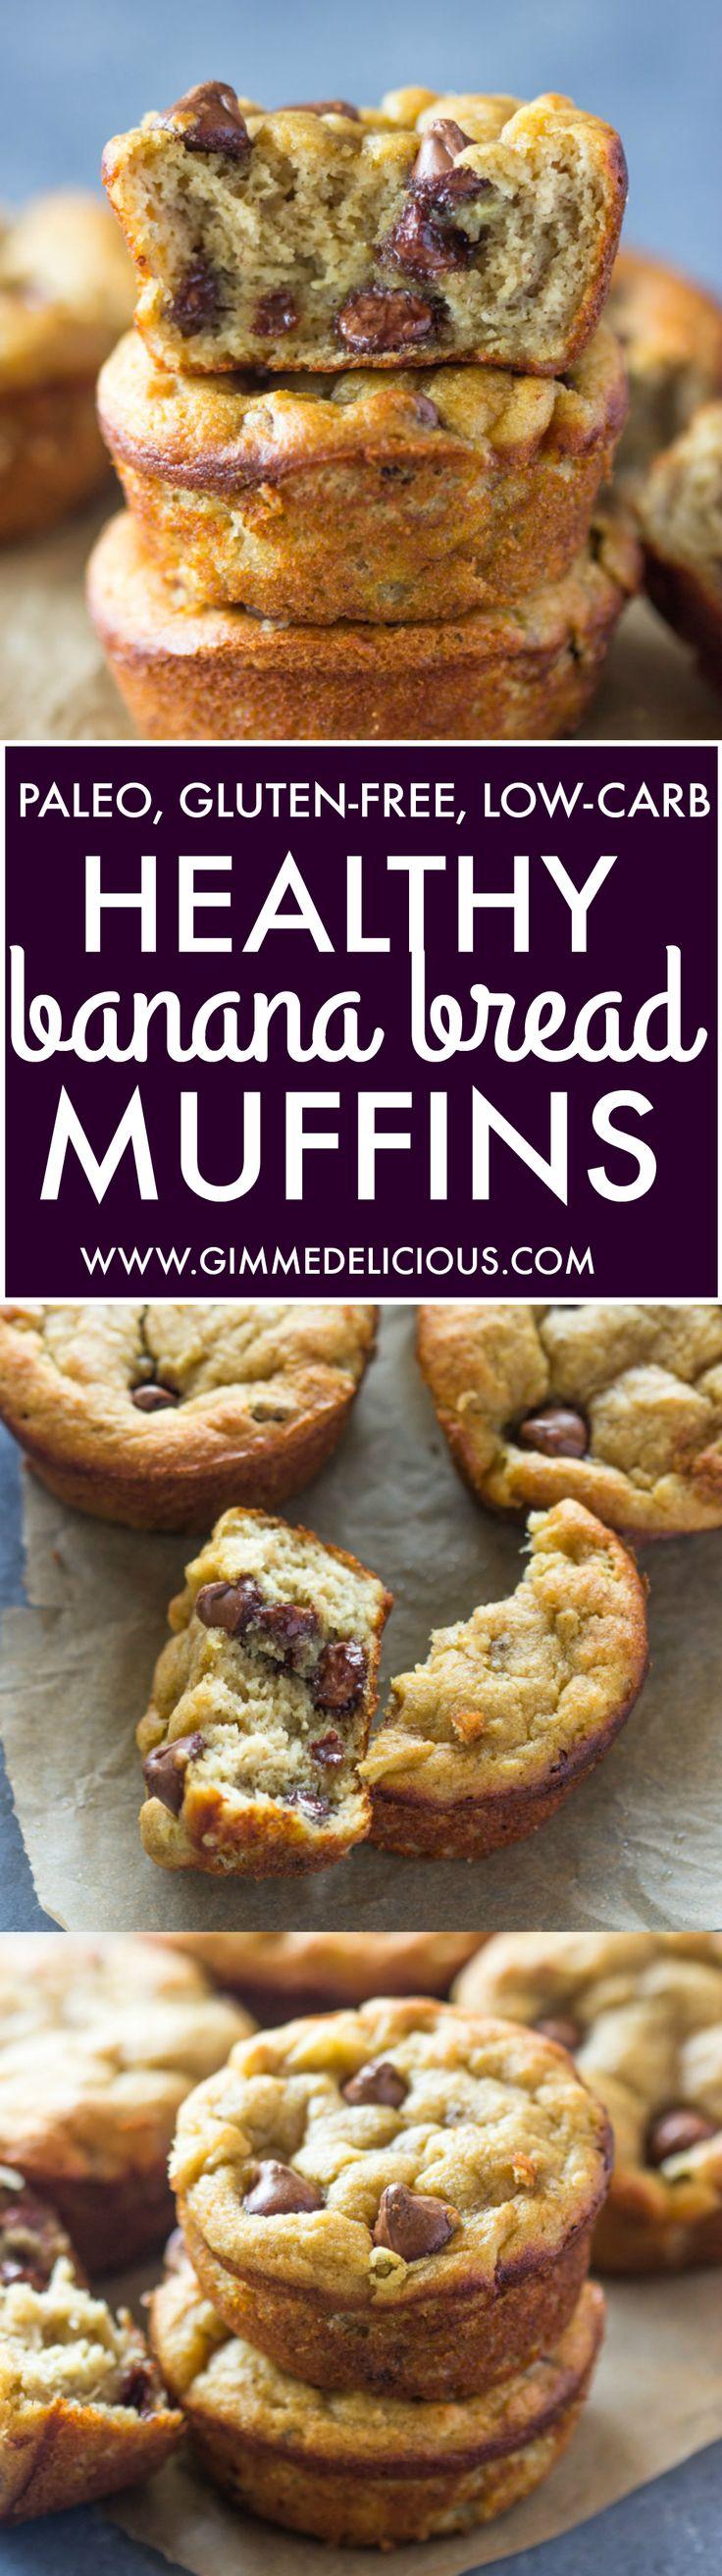 128 mejores imgenes de jim low carb muffins breads en pinterest paleo banana bread muffins gluten free low carb forumfinder Images